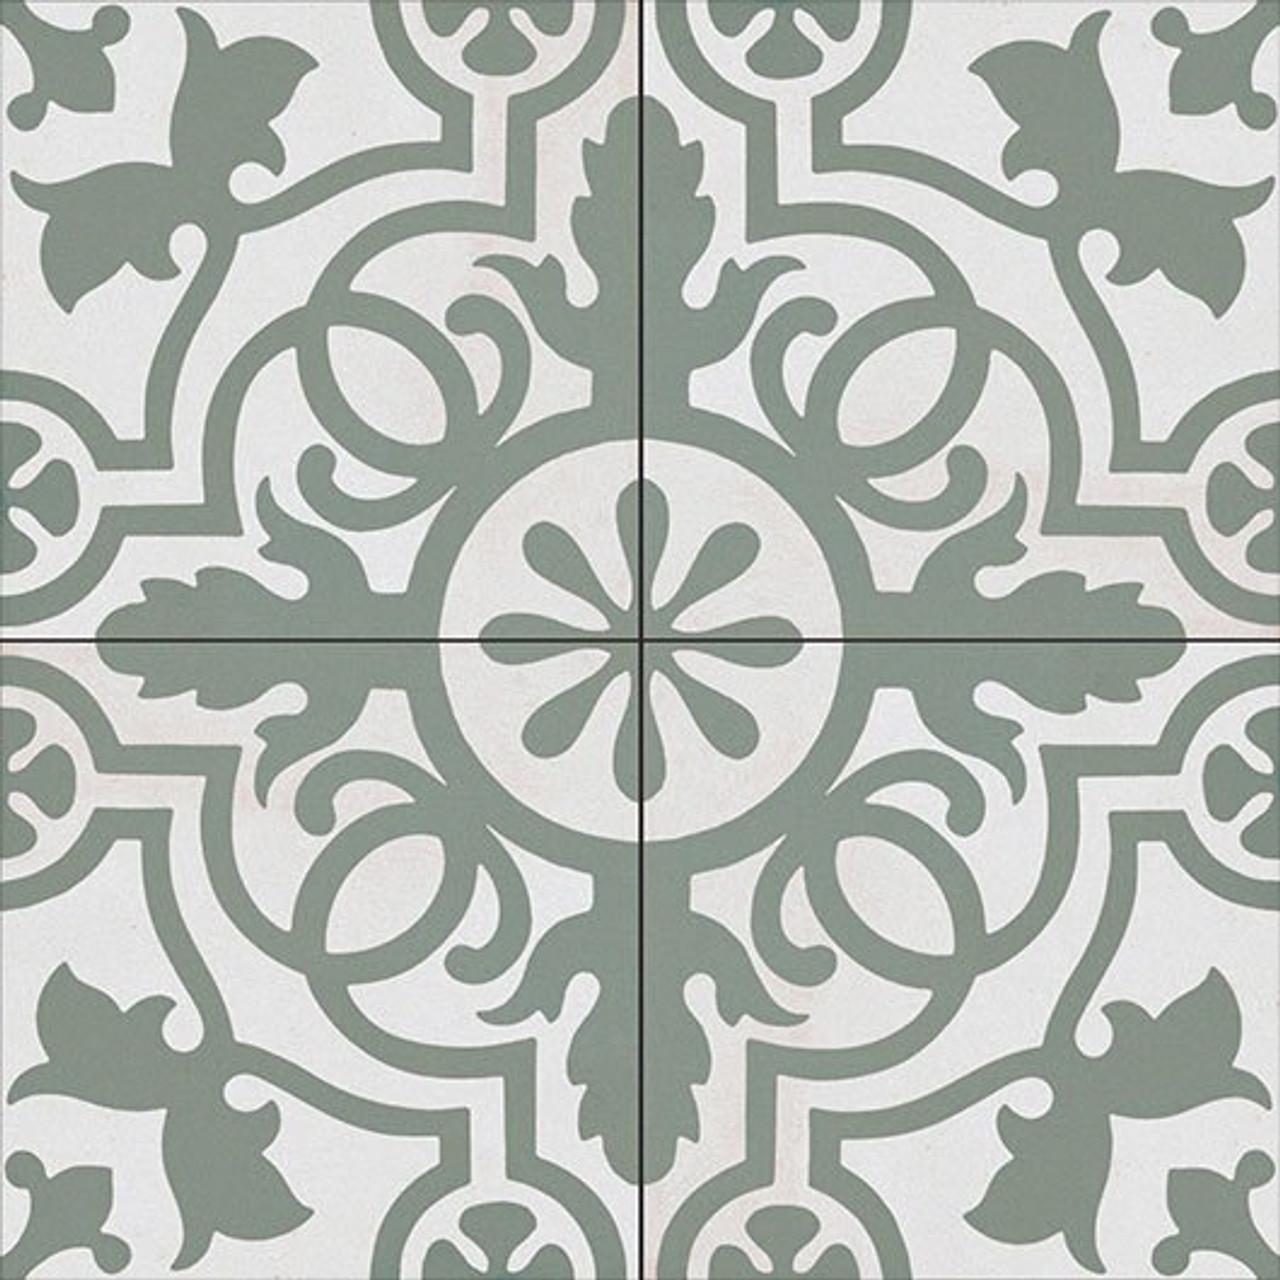 Bella Glass Tiles Amalfi Coast Porcelain Tile Olive Banquet